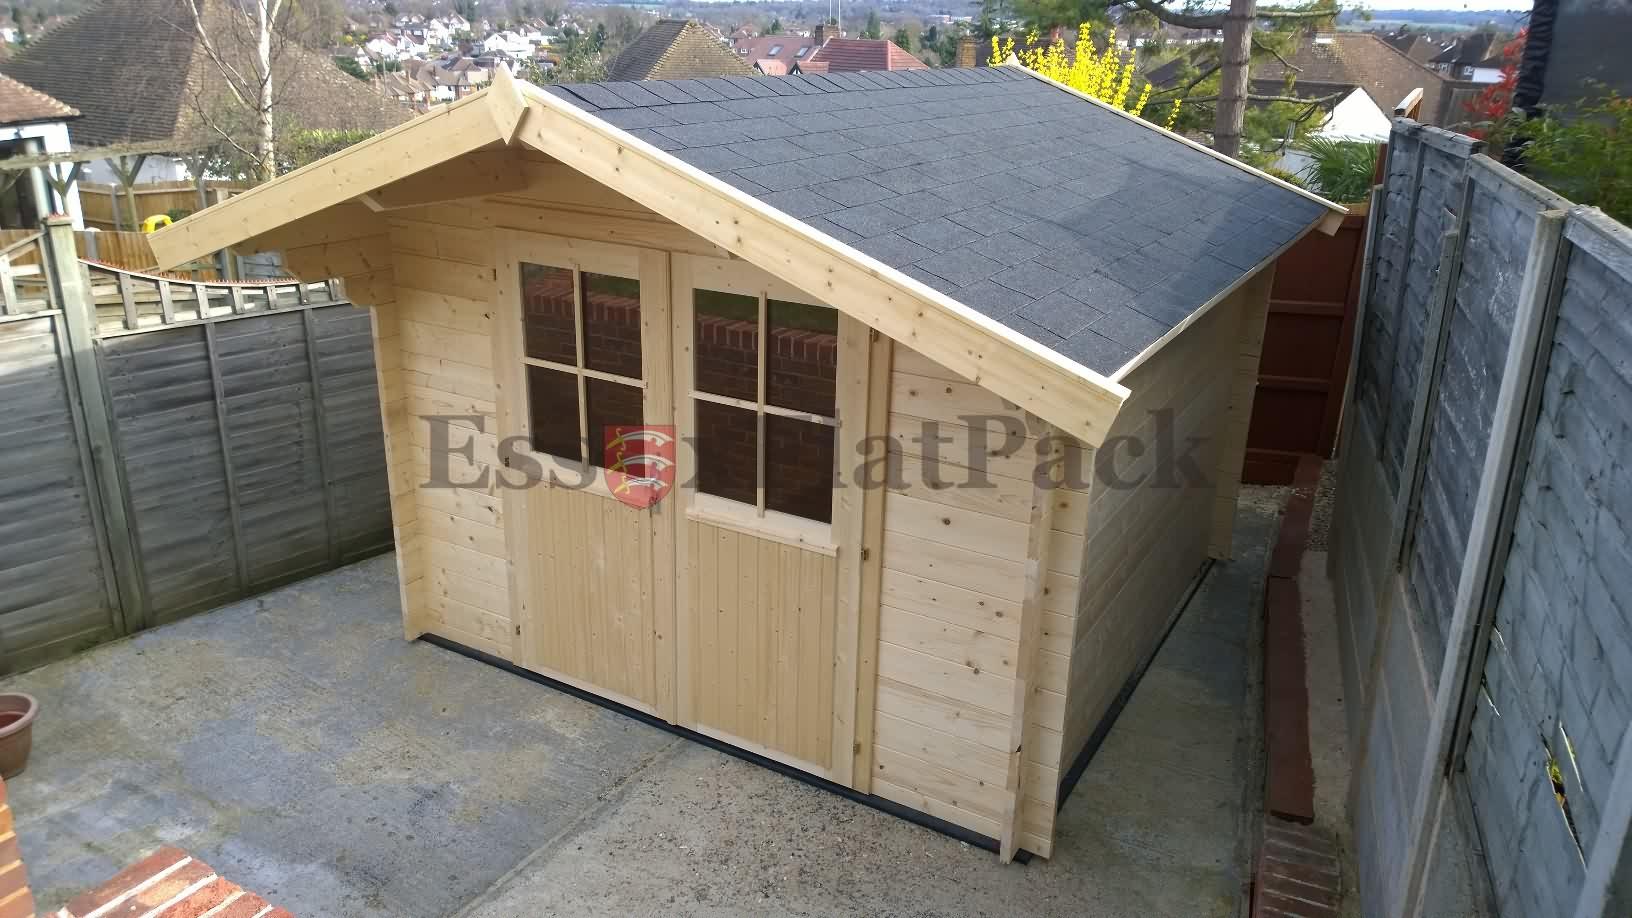 essexflatpack-log-cabins-20170330154544.jpg